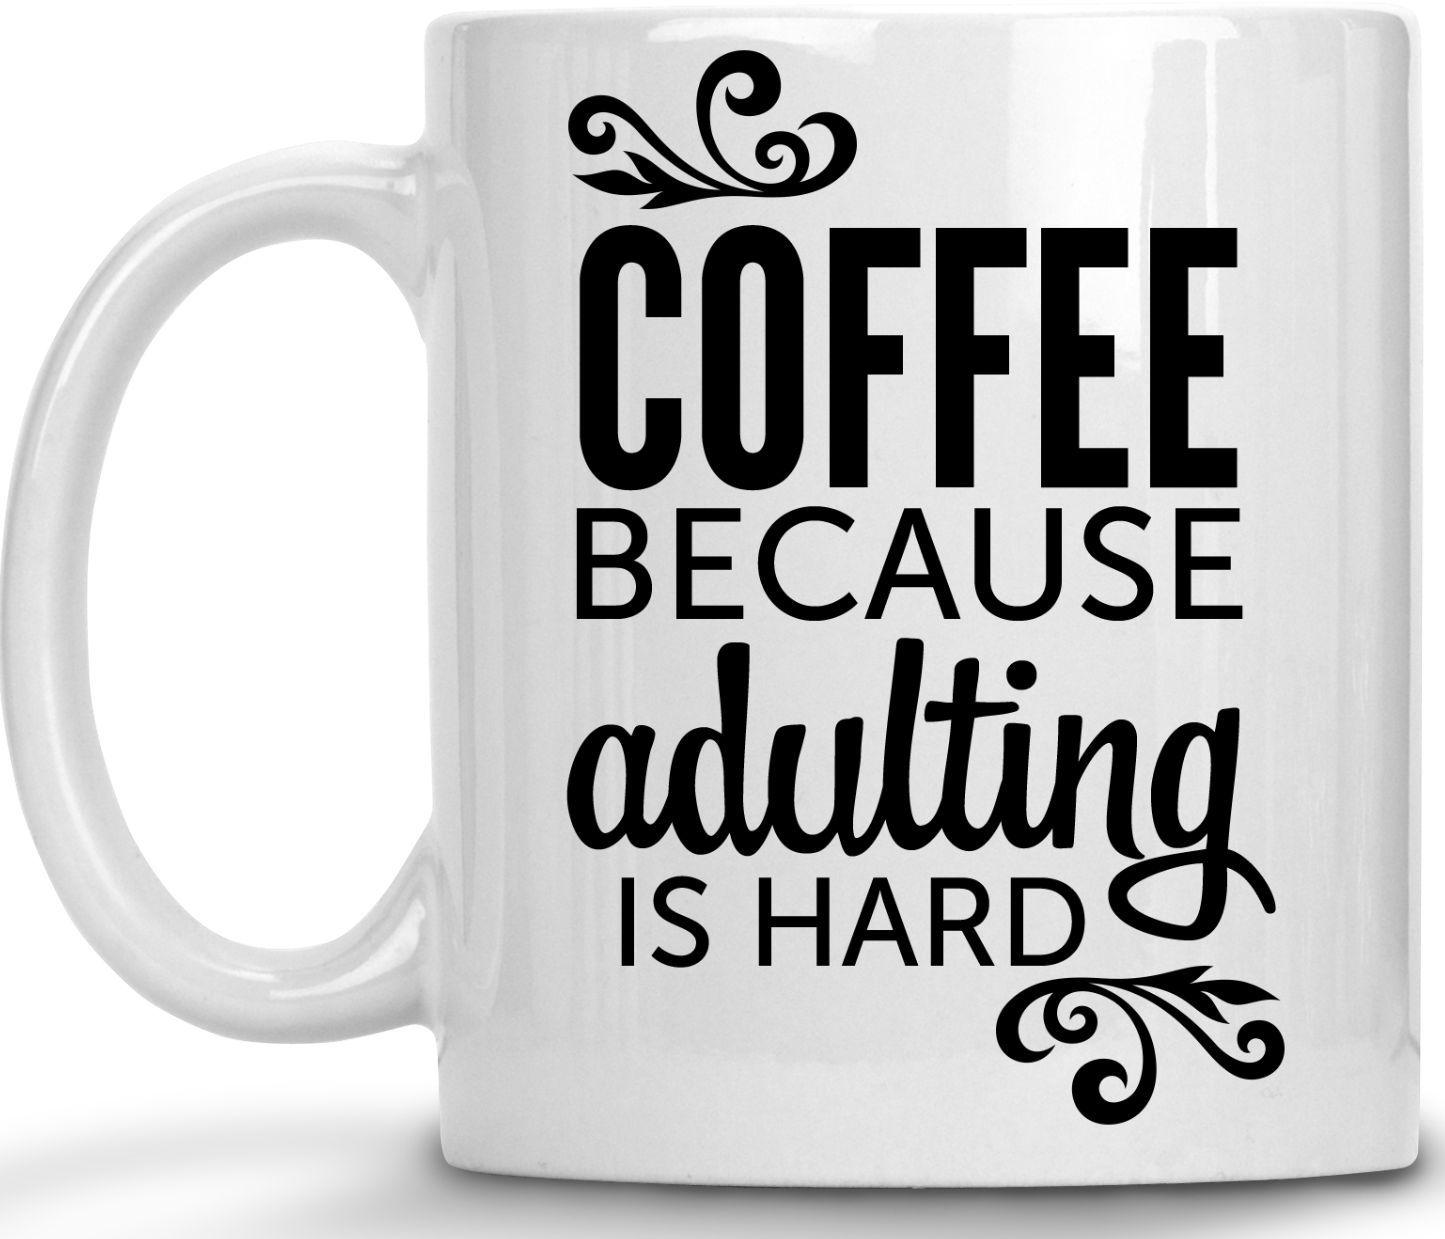 """Coffee Because Adulting"" Funny Coffee Mug"